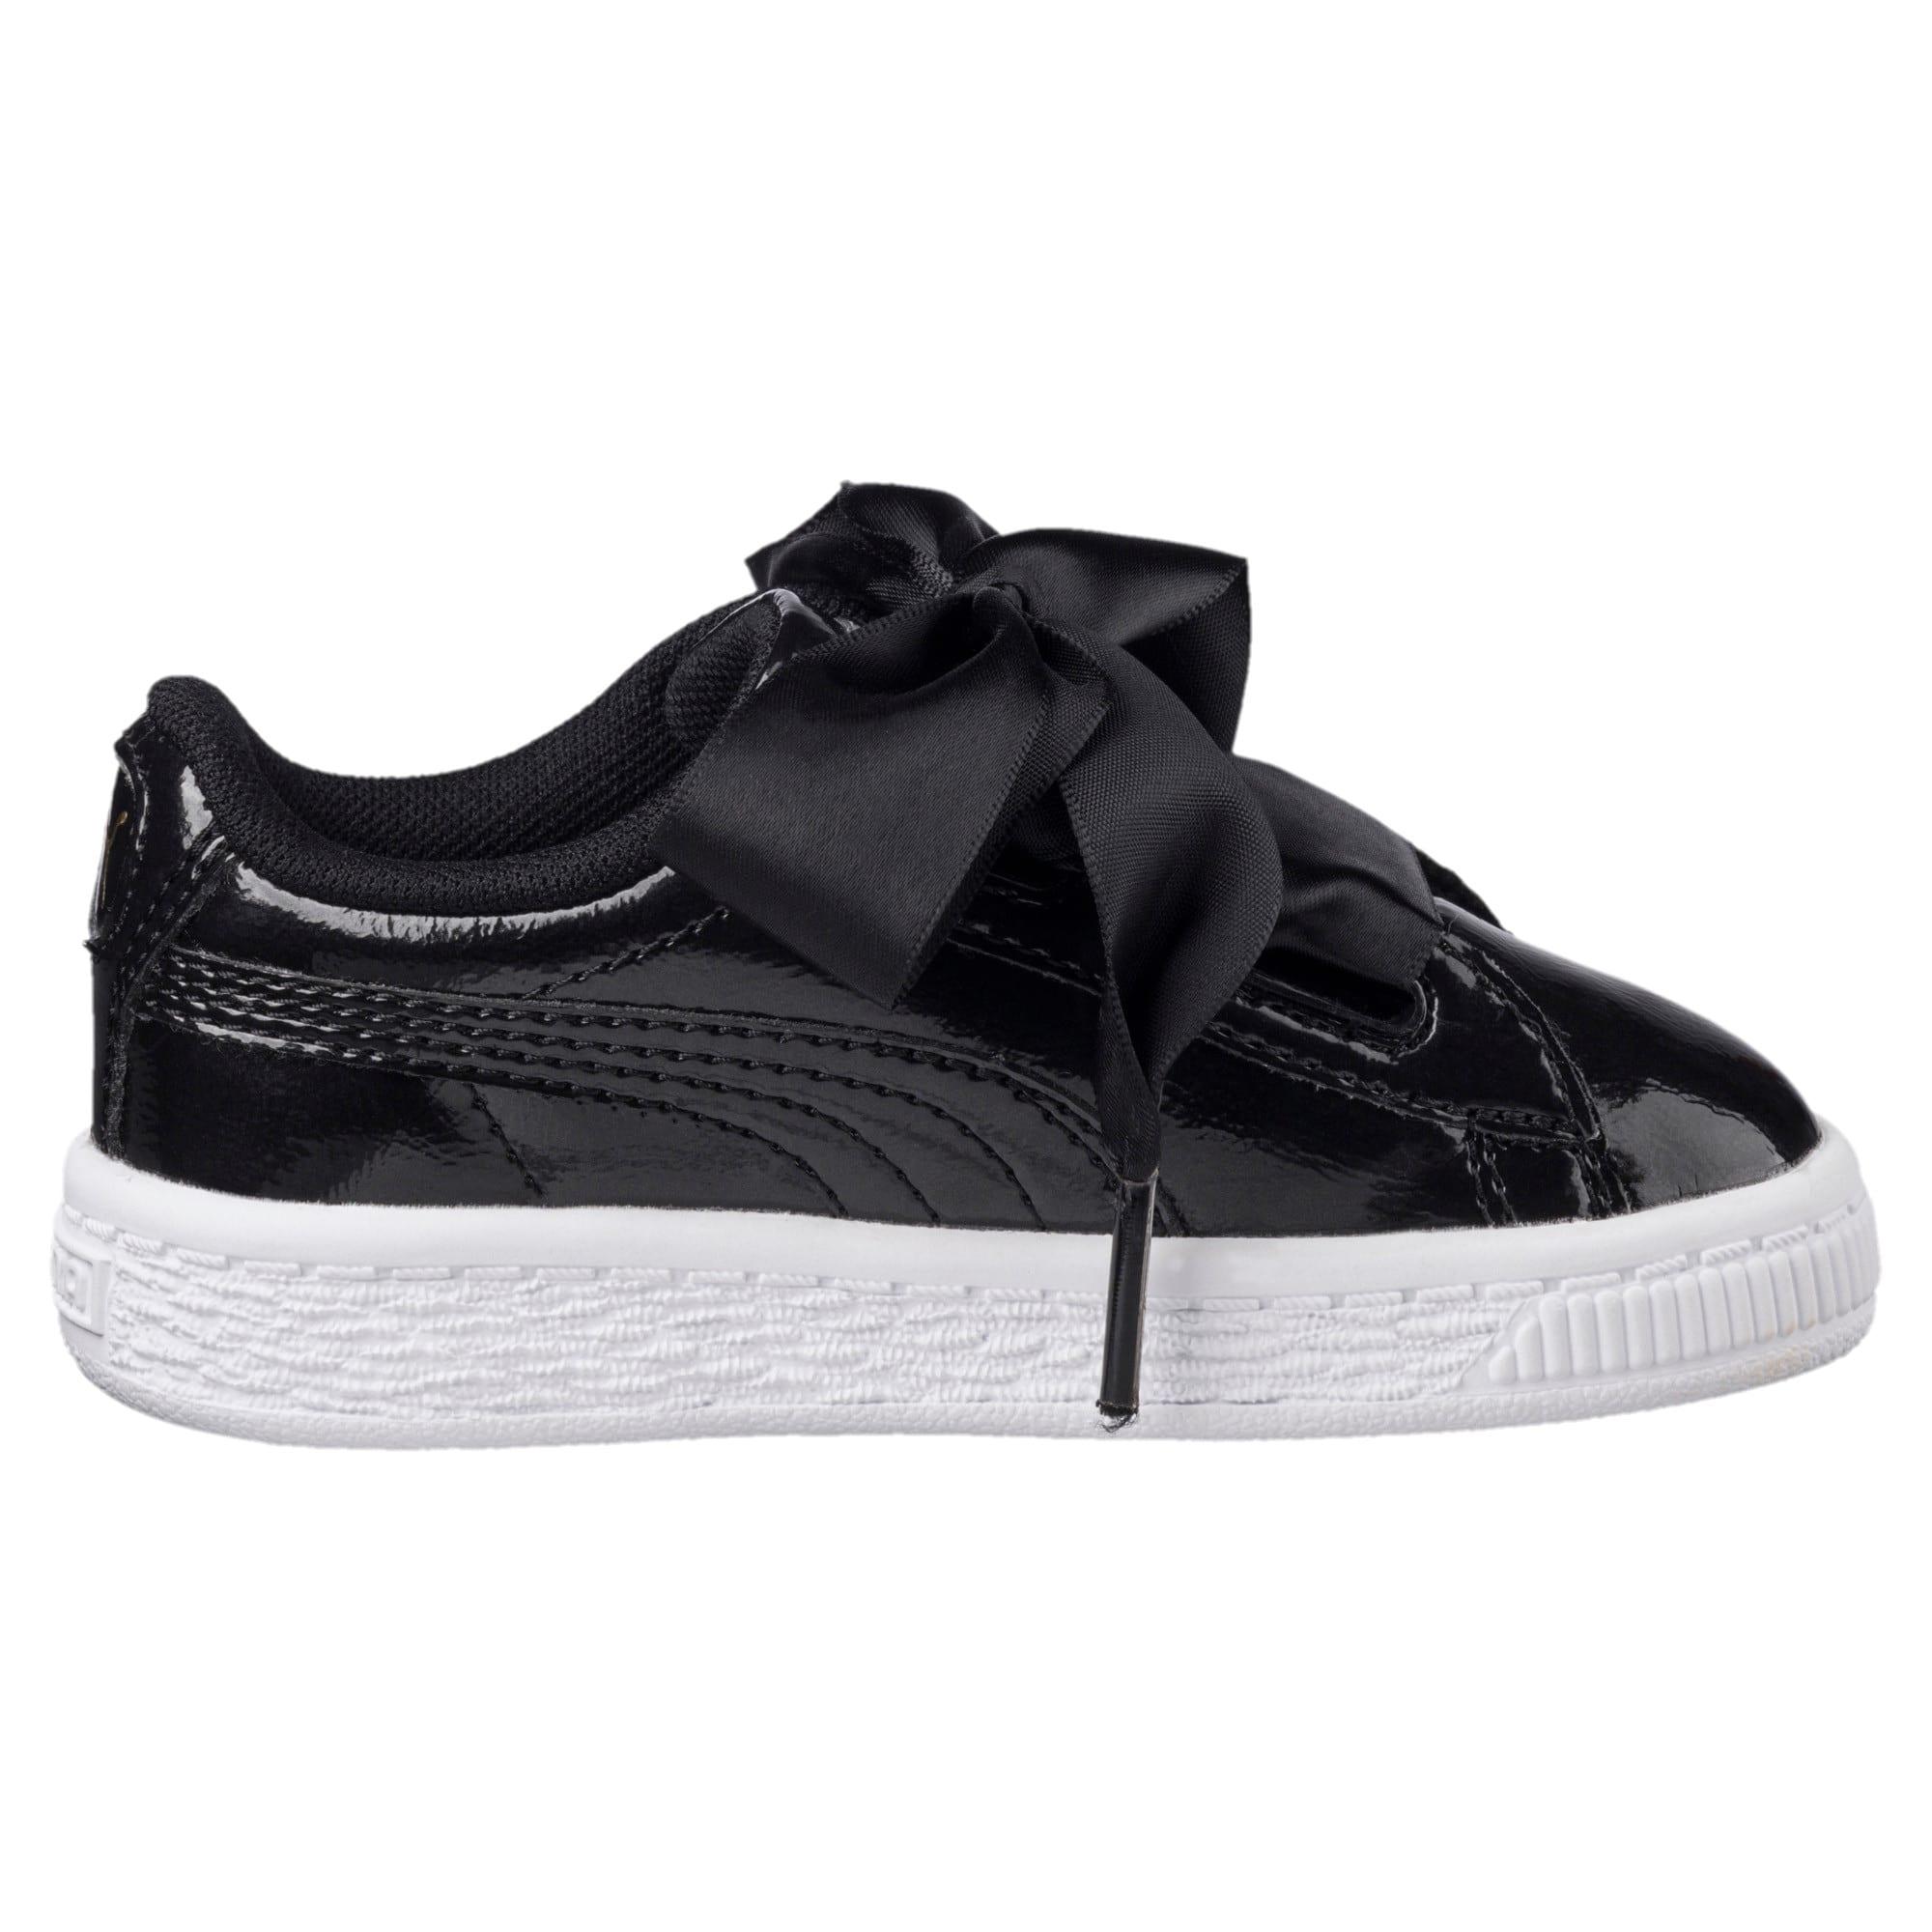 Thumbnail 3 of Basket Heart Glam Girls' Shoes, Puma Black-Puma Black, medium